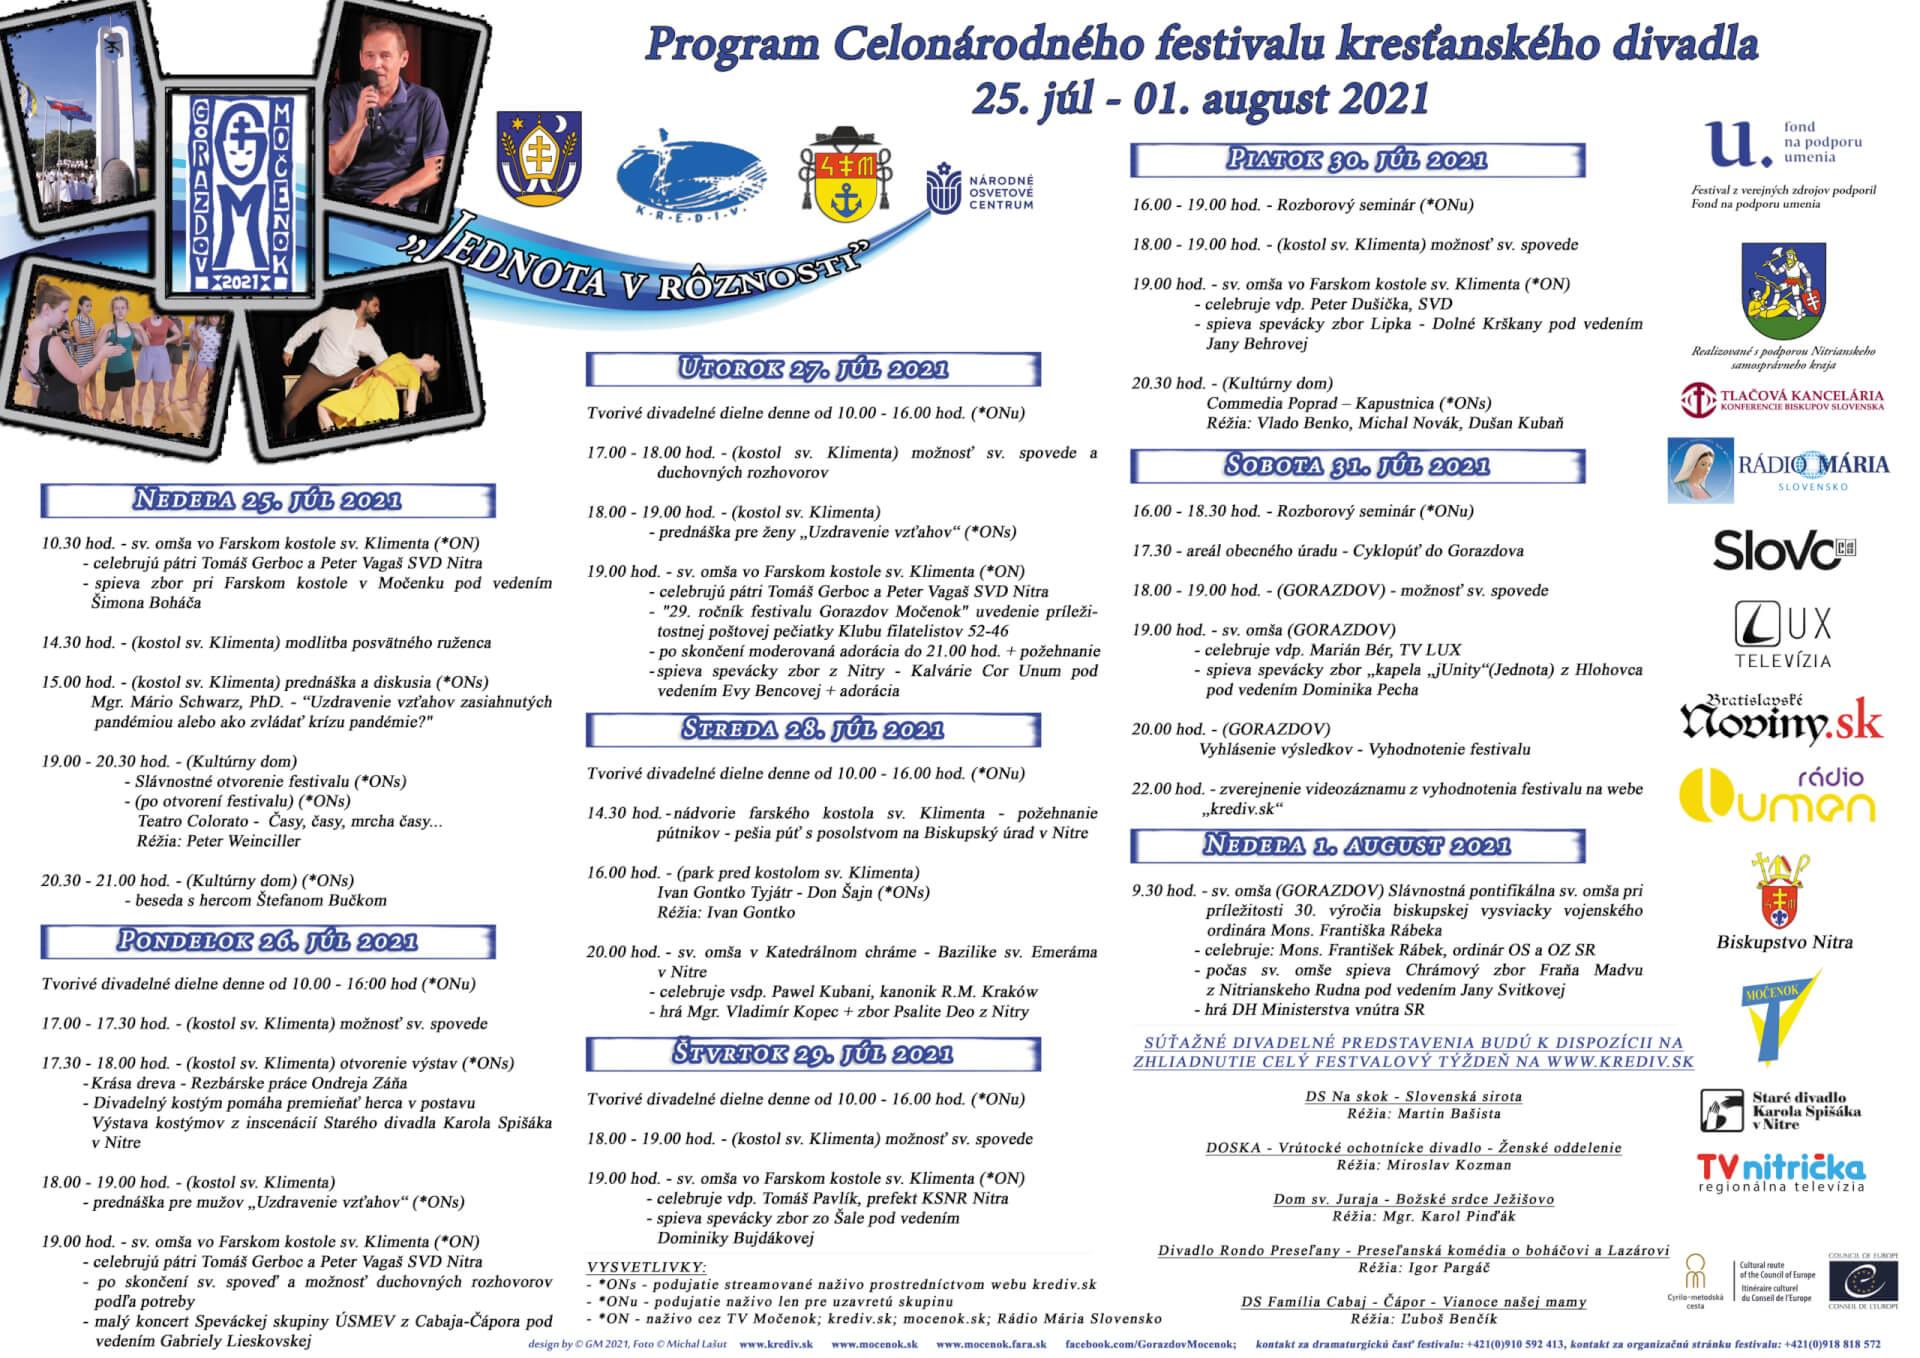 Program GM 2021